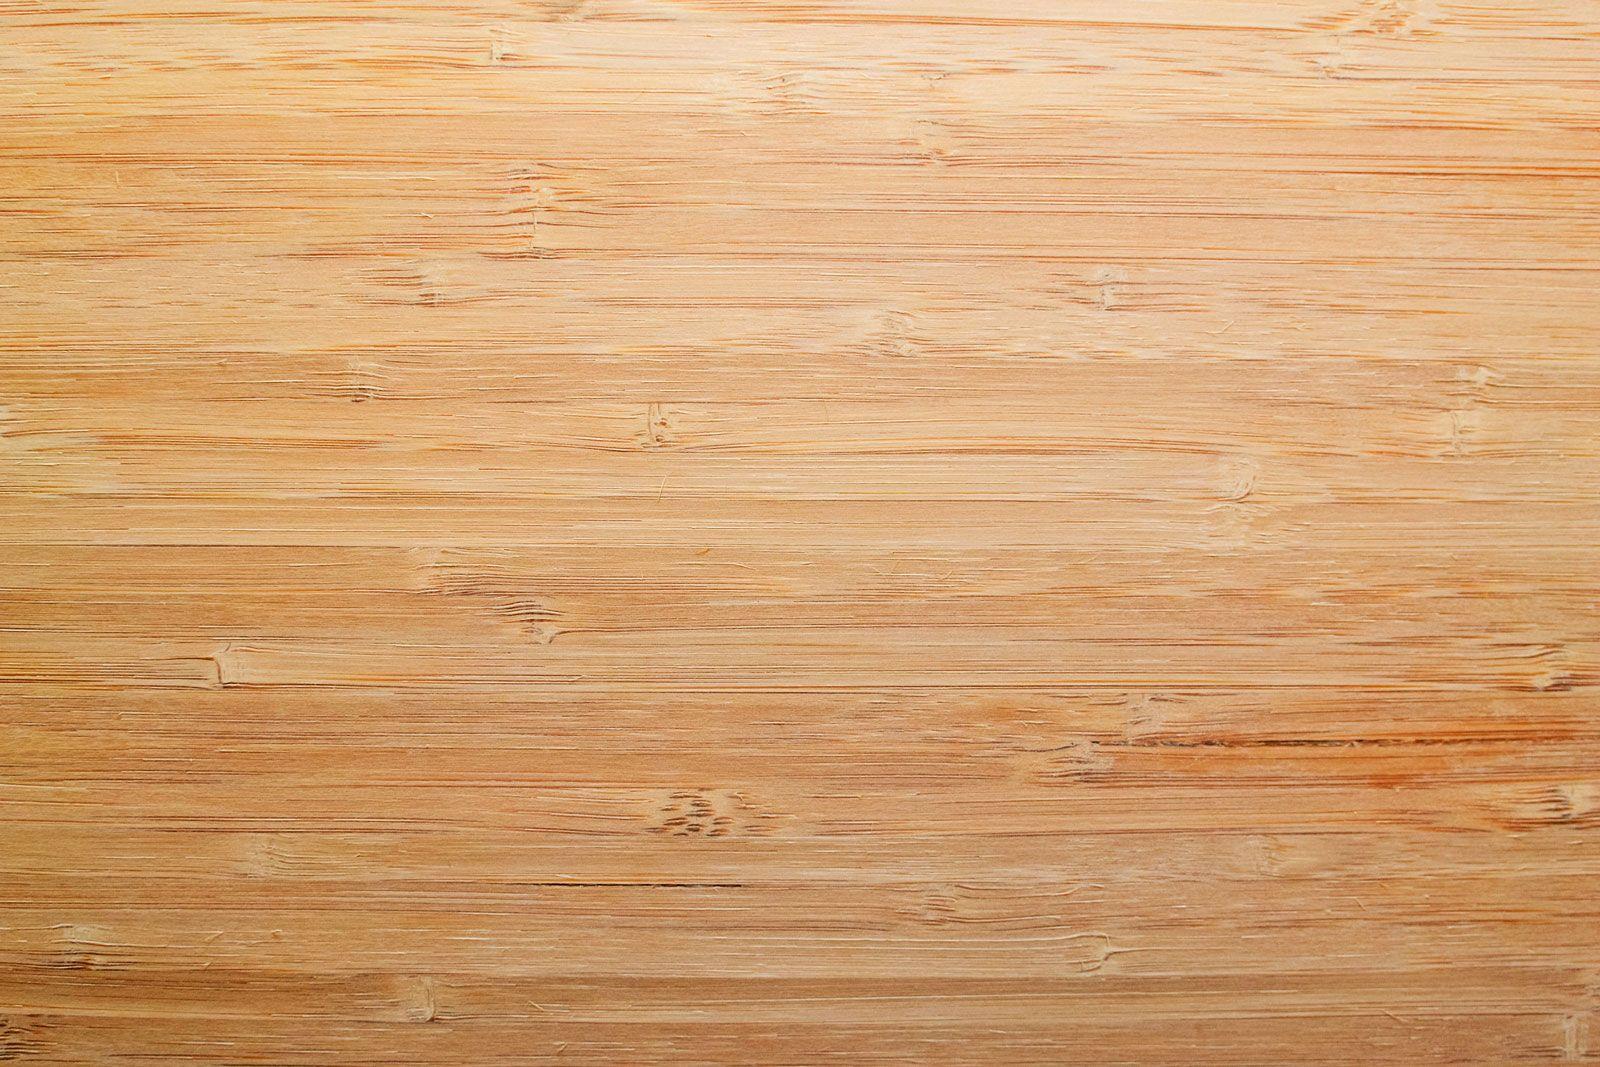 Psd mockups bamboo wood flooring texture pattern for Bamboo hardwood flooring